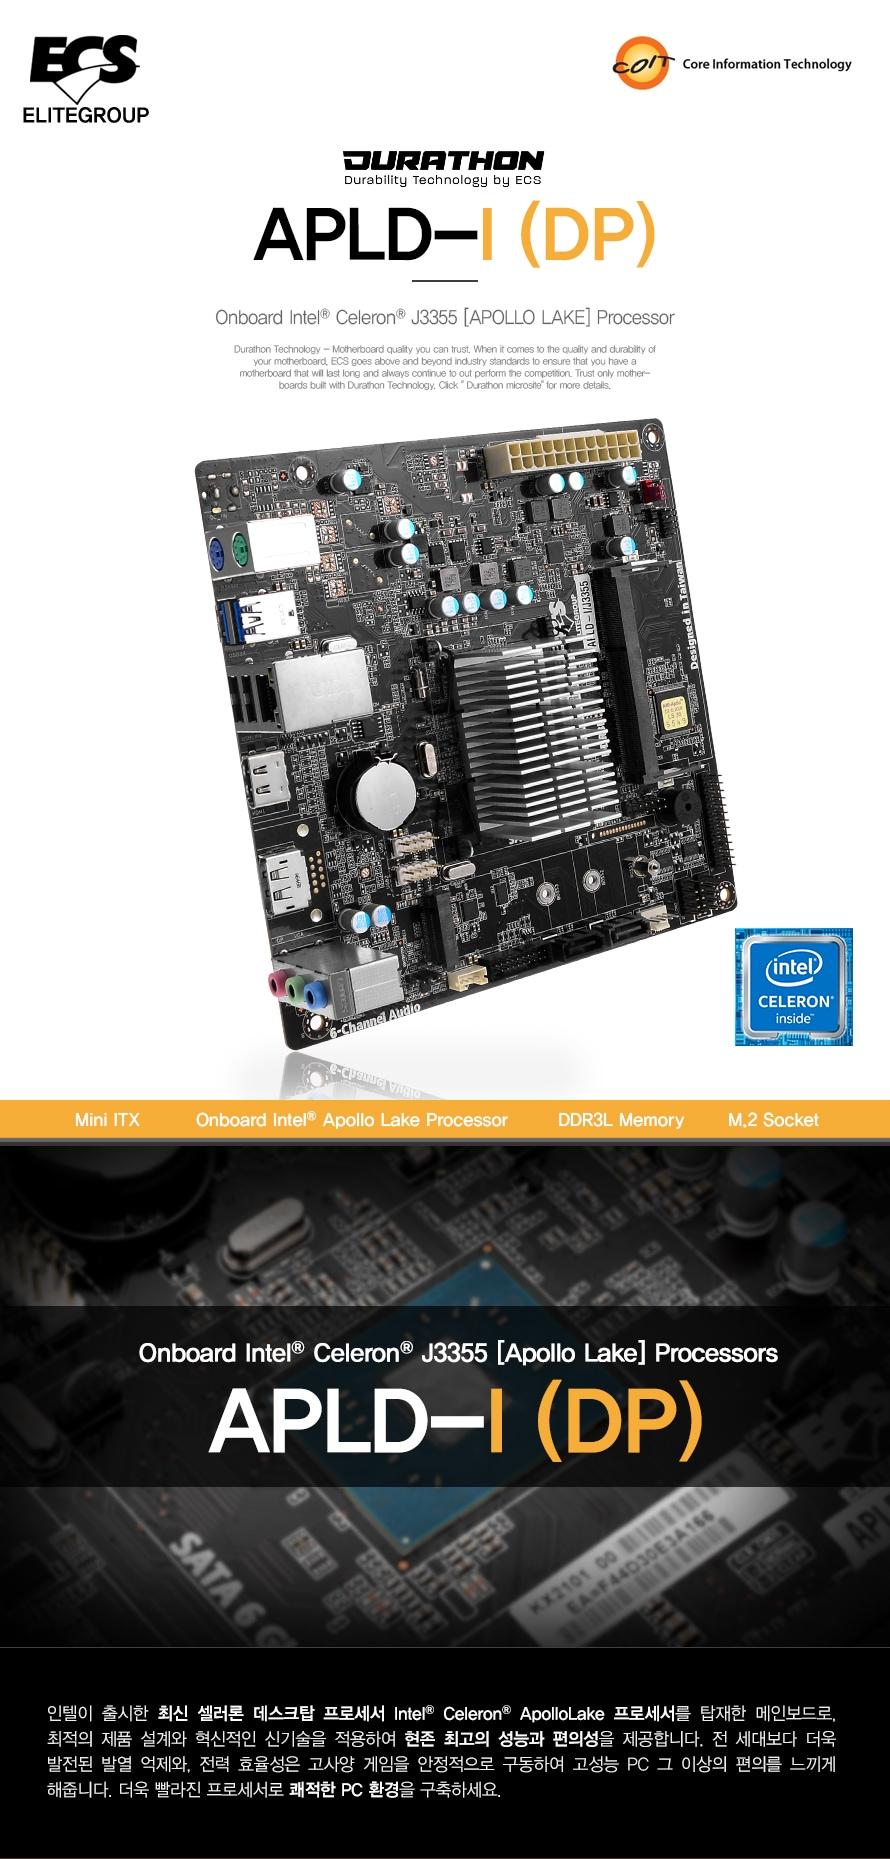 DURATHON        DURABILITY TECHNOLOGY BY ECS                APLD I J3355 DP                미니 ITX        온보드 인텔 아폴로레이크 프로세서        DDR3L 메모리         M.2 소켓        인텔이 출시한 최신 셀러론 데스크탑 프로세서 인텔 셀러론 아폴로레이크 프로세서를 탑재한        메인보드로 최적의 제품 설계와 혁시적인 신기술을 적용하여 현존 최고의 성능과 편의성을 제공합니다        전 세대보다 더욱 발전된 발열 억제와 전력 효율성은 고사양 게임을 안정적으로 구동하여 고성능        pc 그 이상의 편의를 느끼게 해줍니다. 더욱 빨라진 프로세서로 쾌적한 PC 환경을 구축하세요